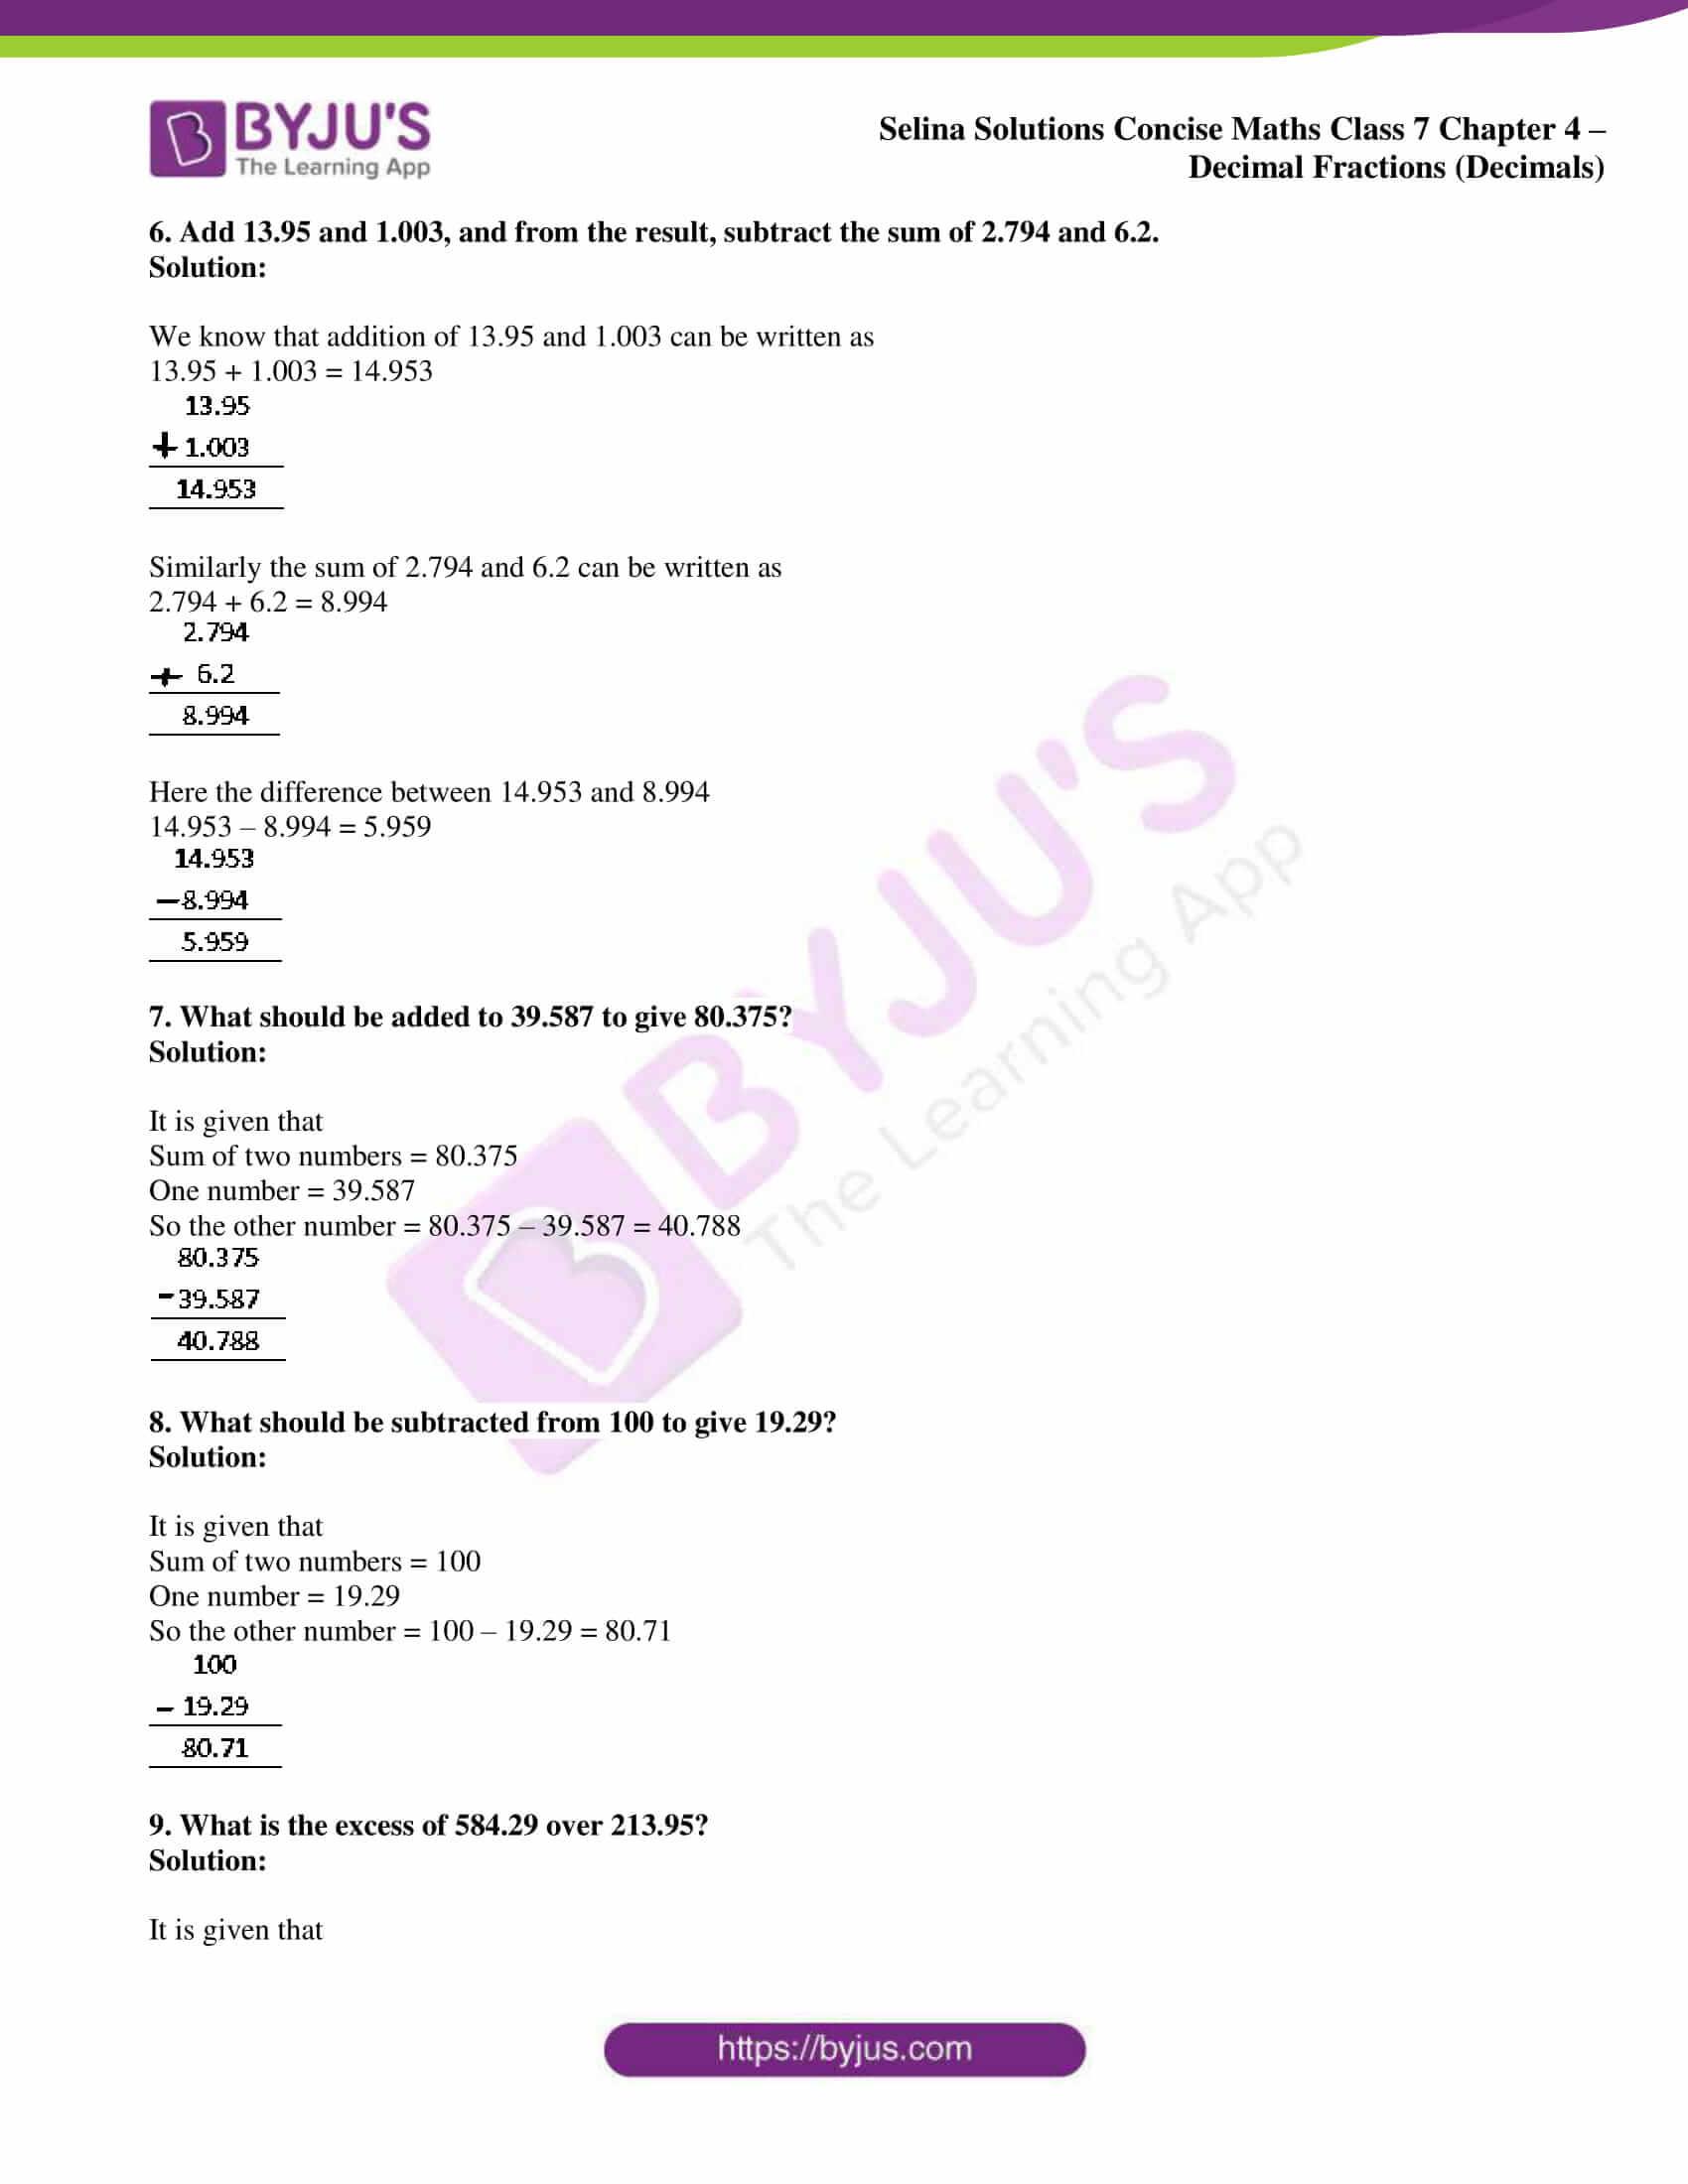 selina sol concise maths class 7 ch4 ex 4b 08